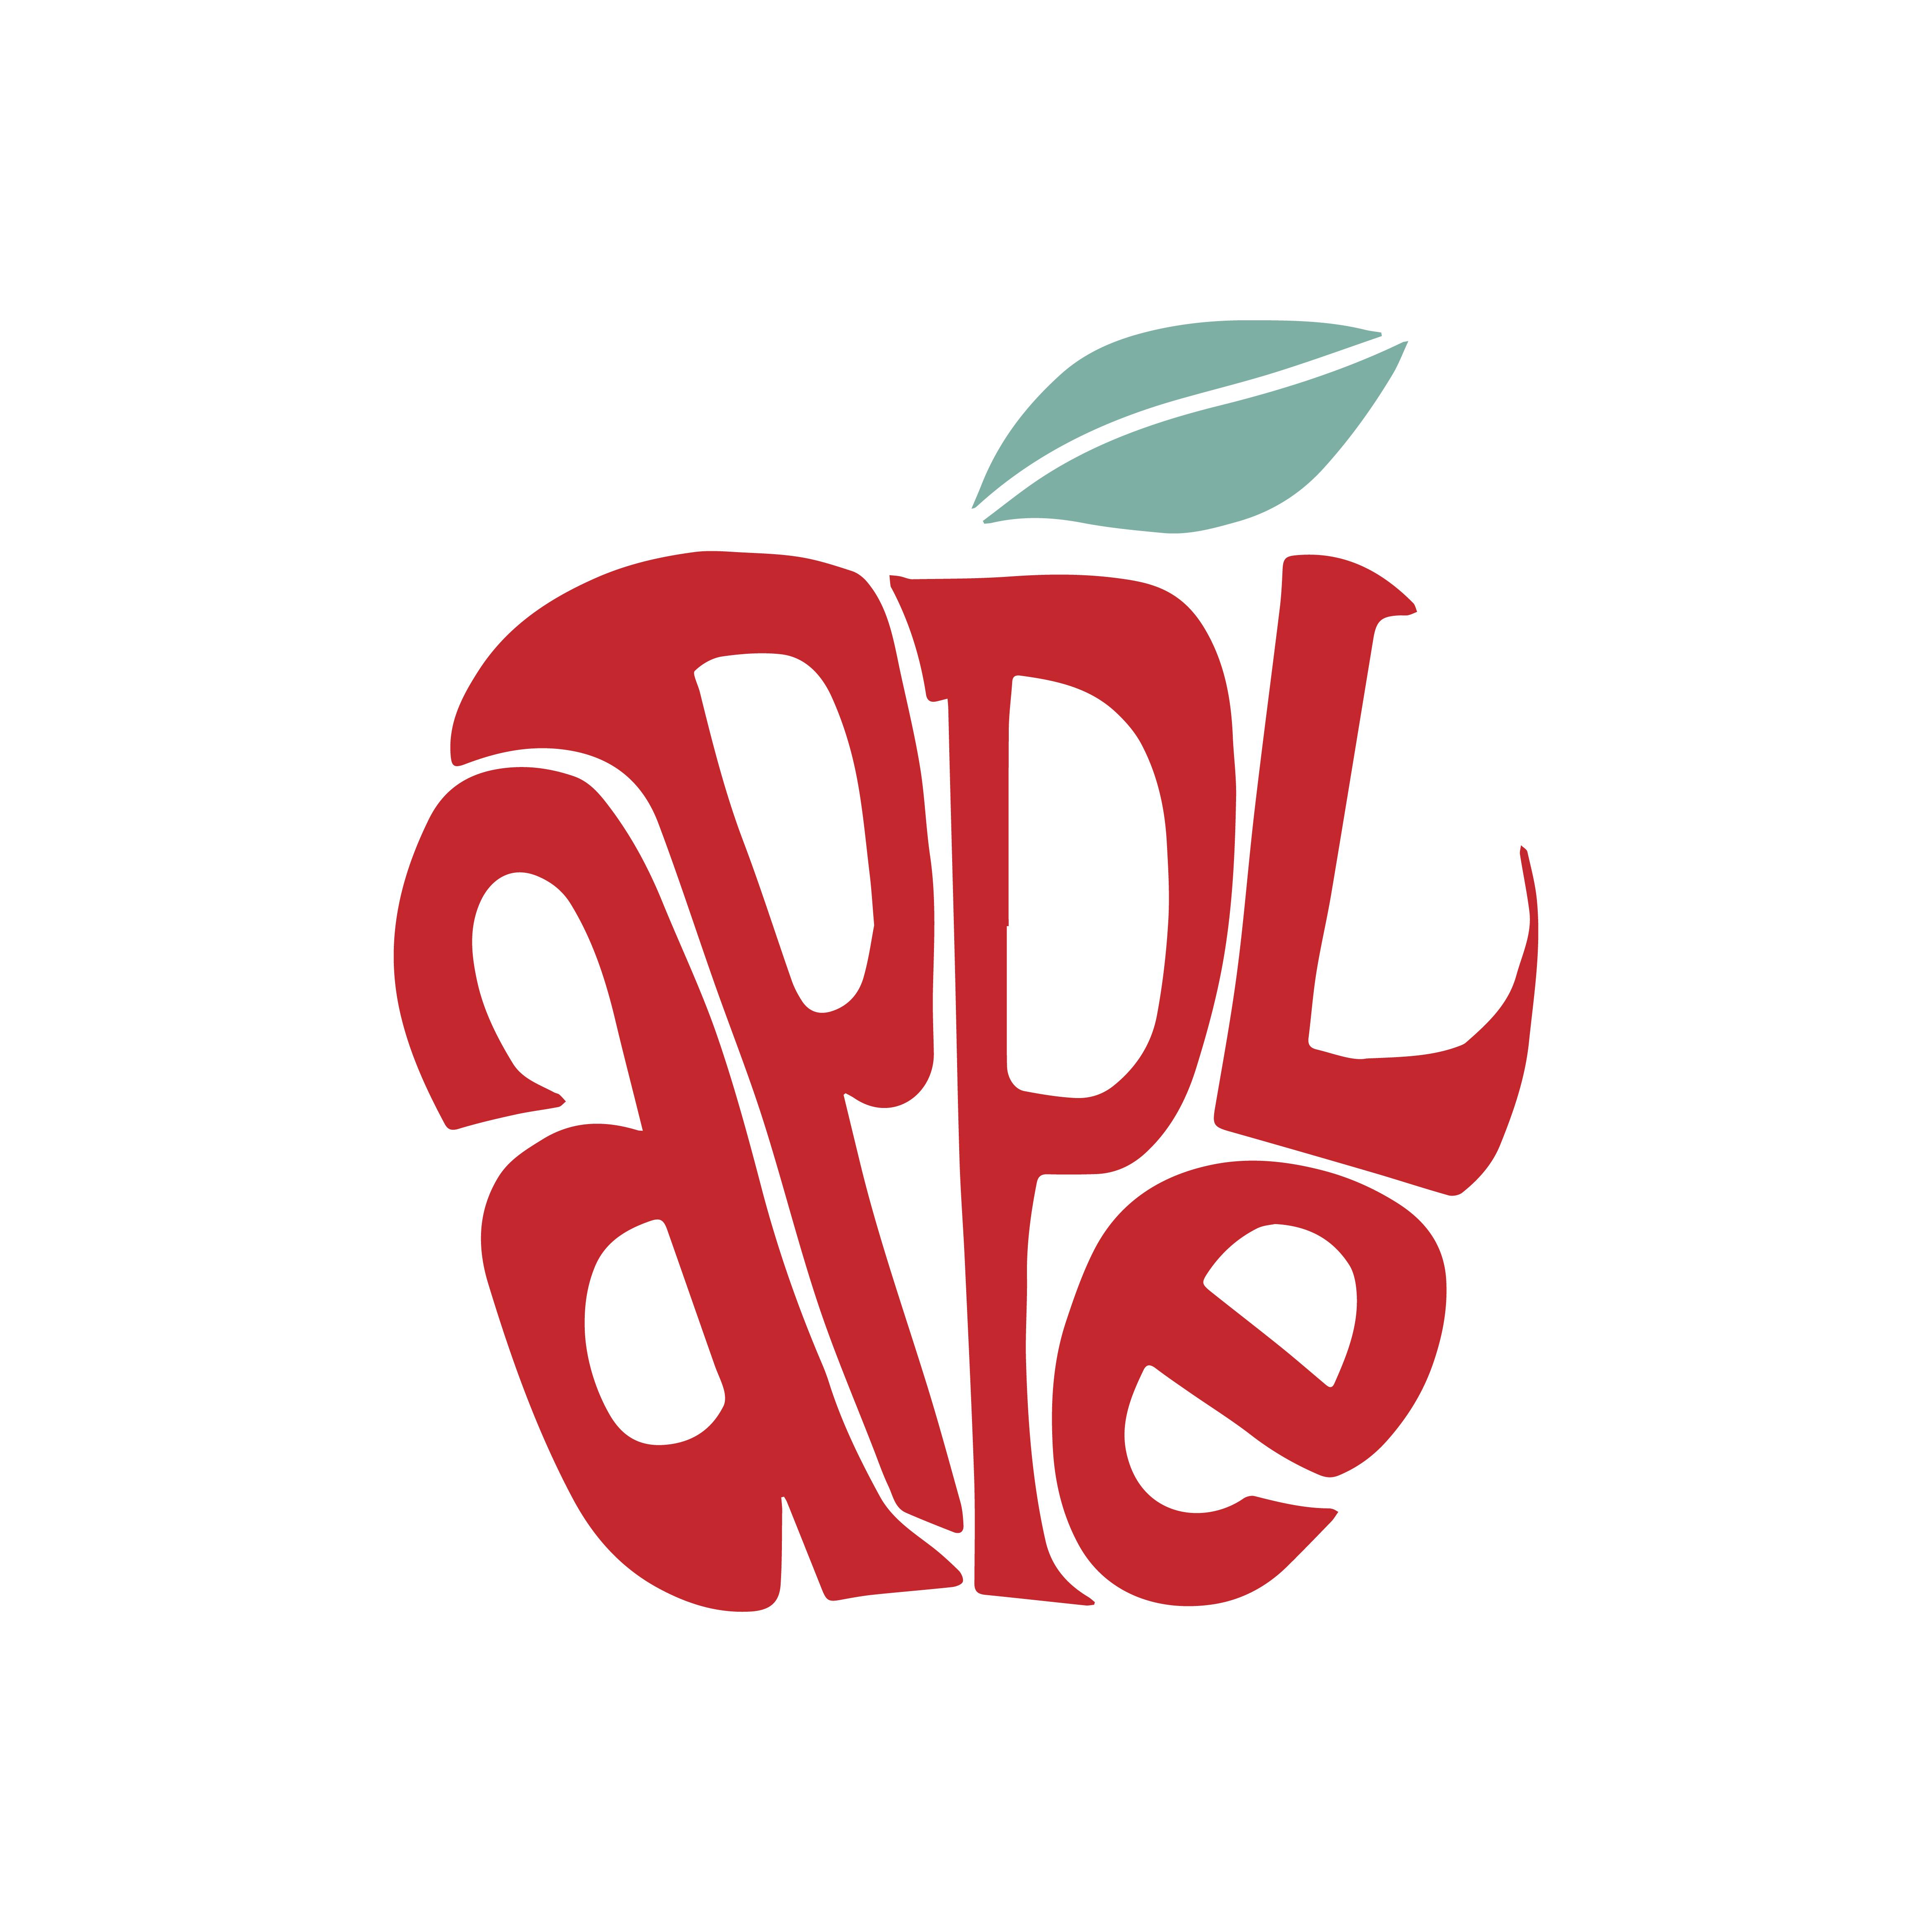 Mint Leaves Organic Logo Concept: Apple Word Typography Design Illustration